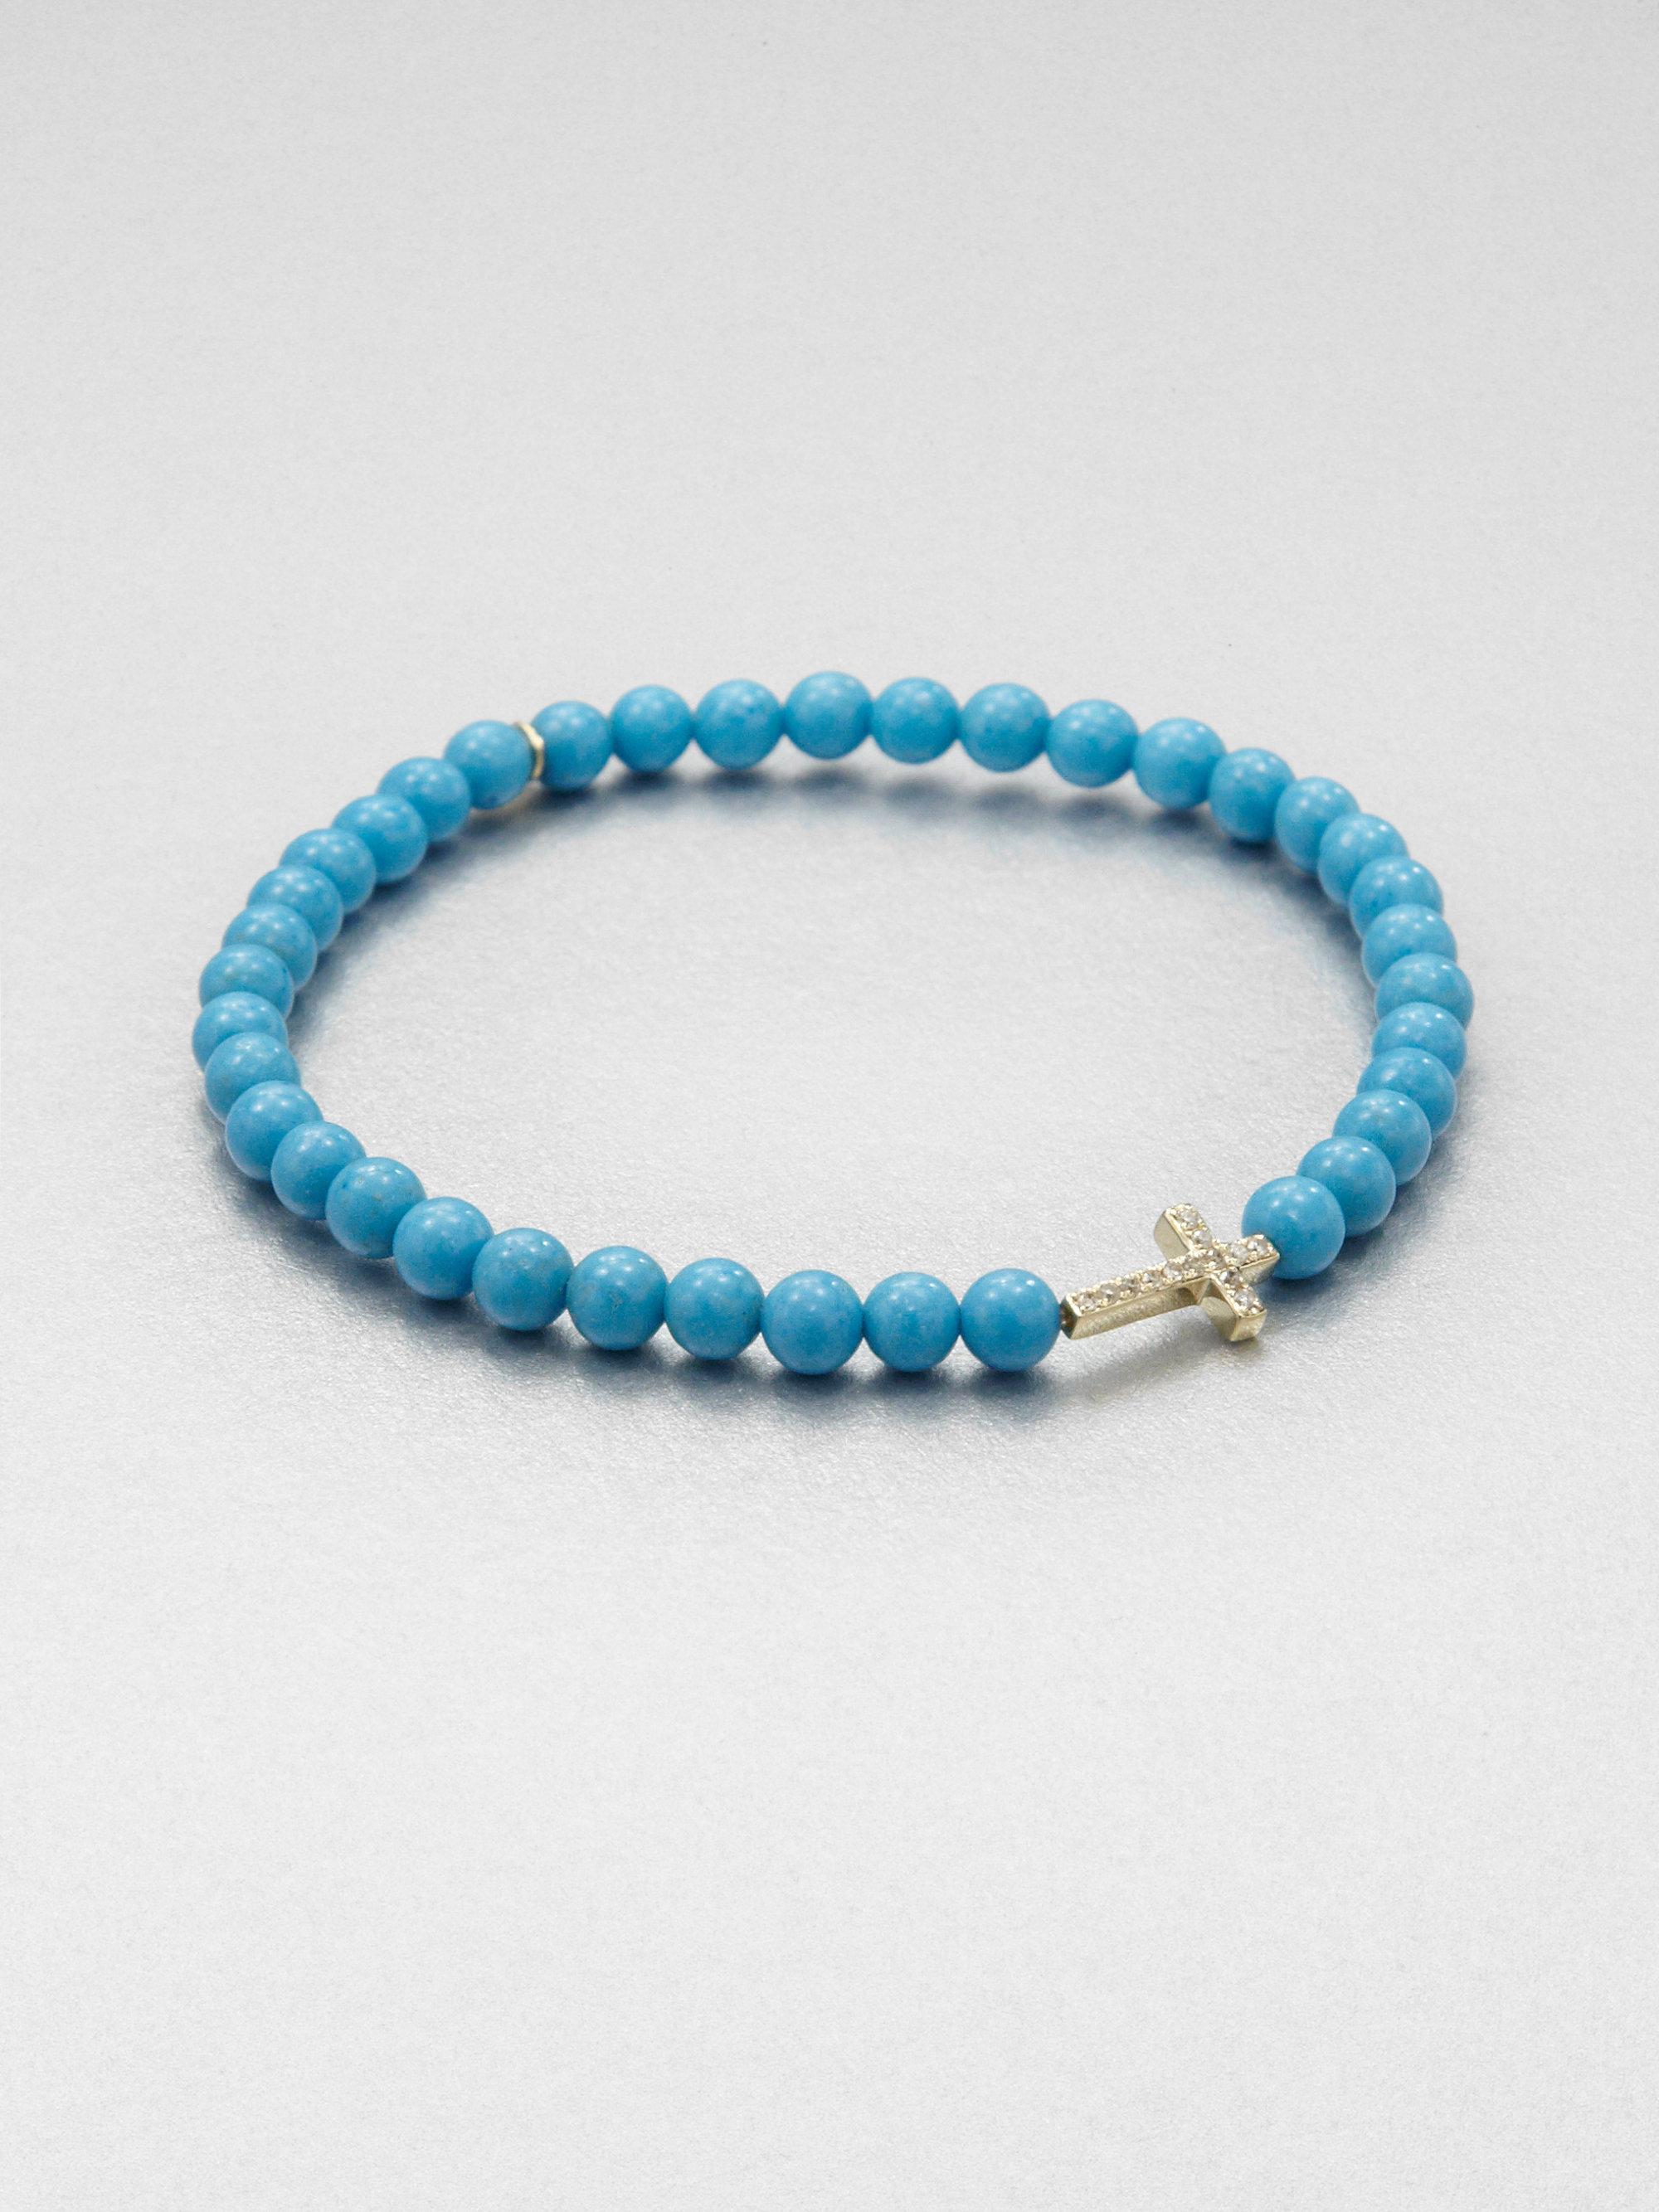 Sydney Evan 4mm Turquoise Beaded Bracelet with Rainbow Eye Charm RY3ey